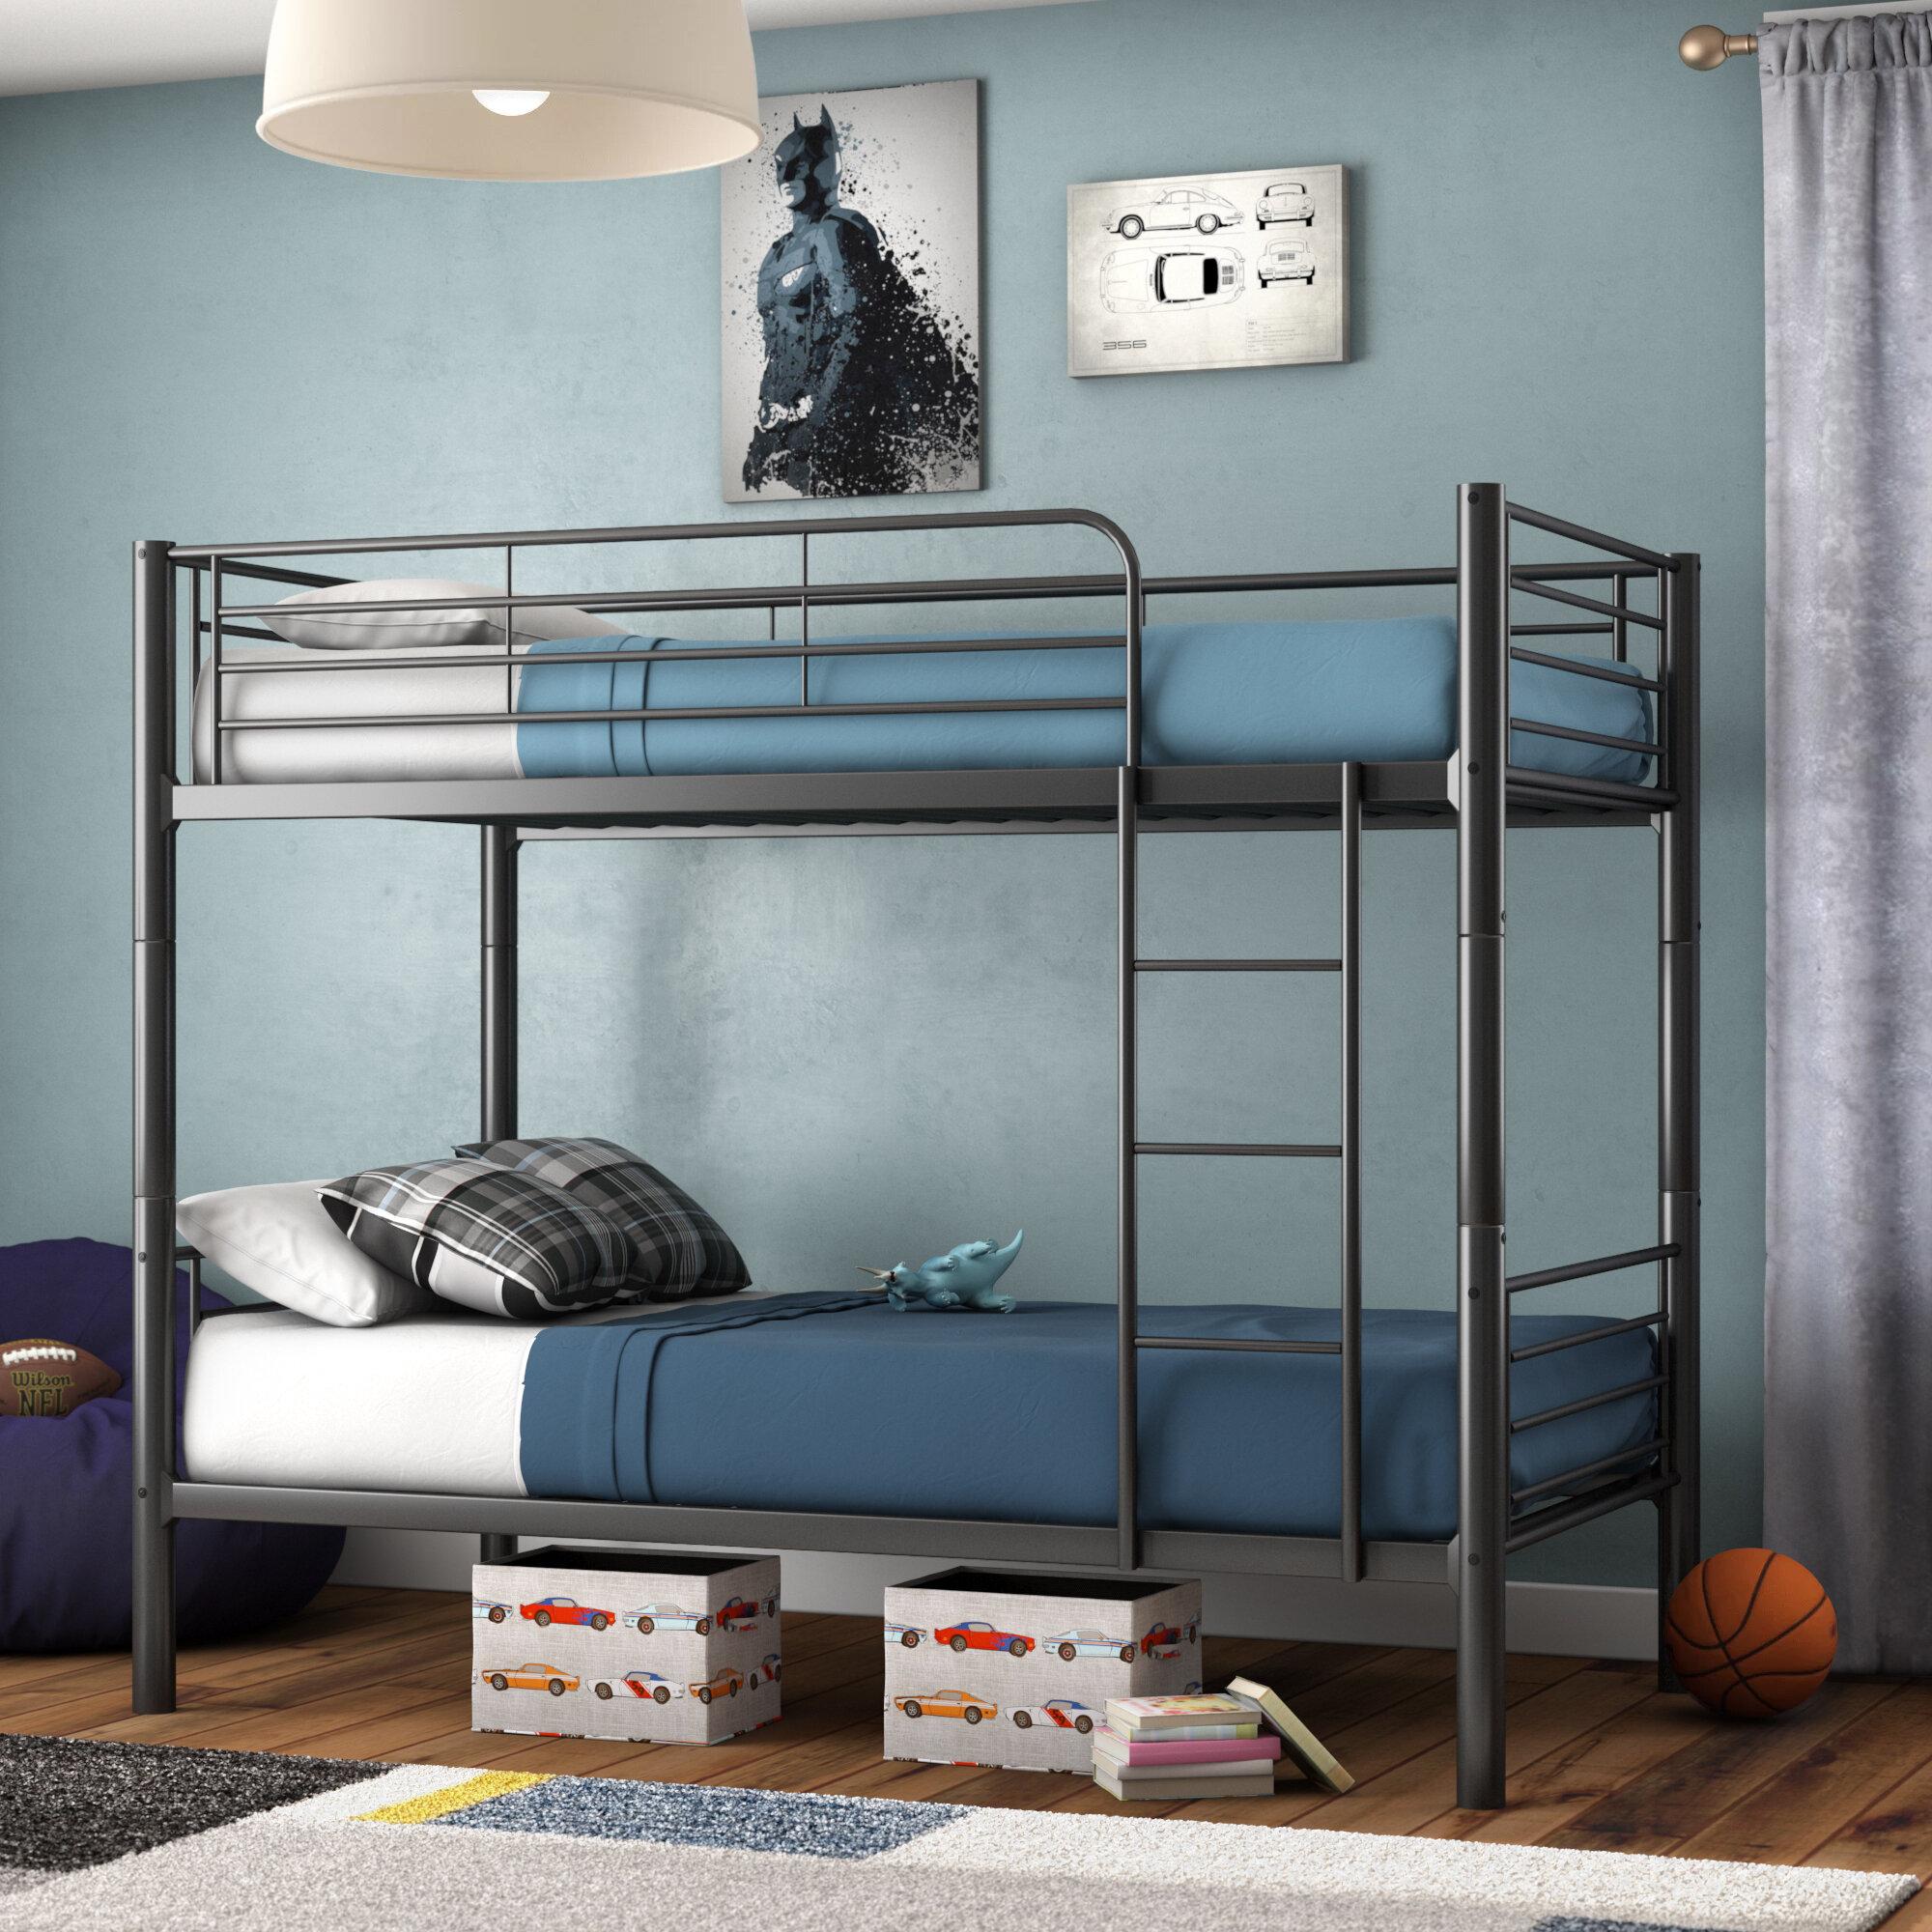 Metal Kids Beds Free Shipping Over 35 Wayfair